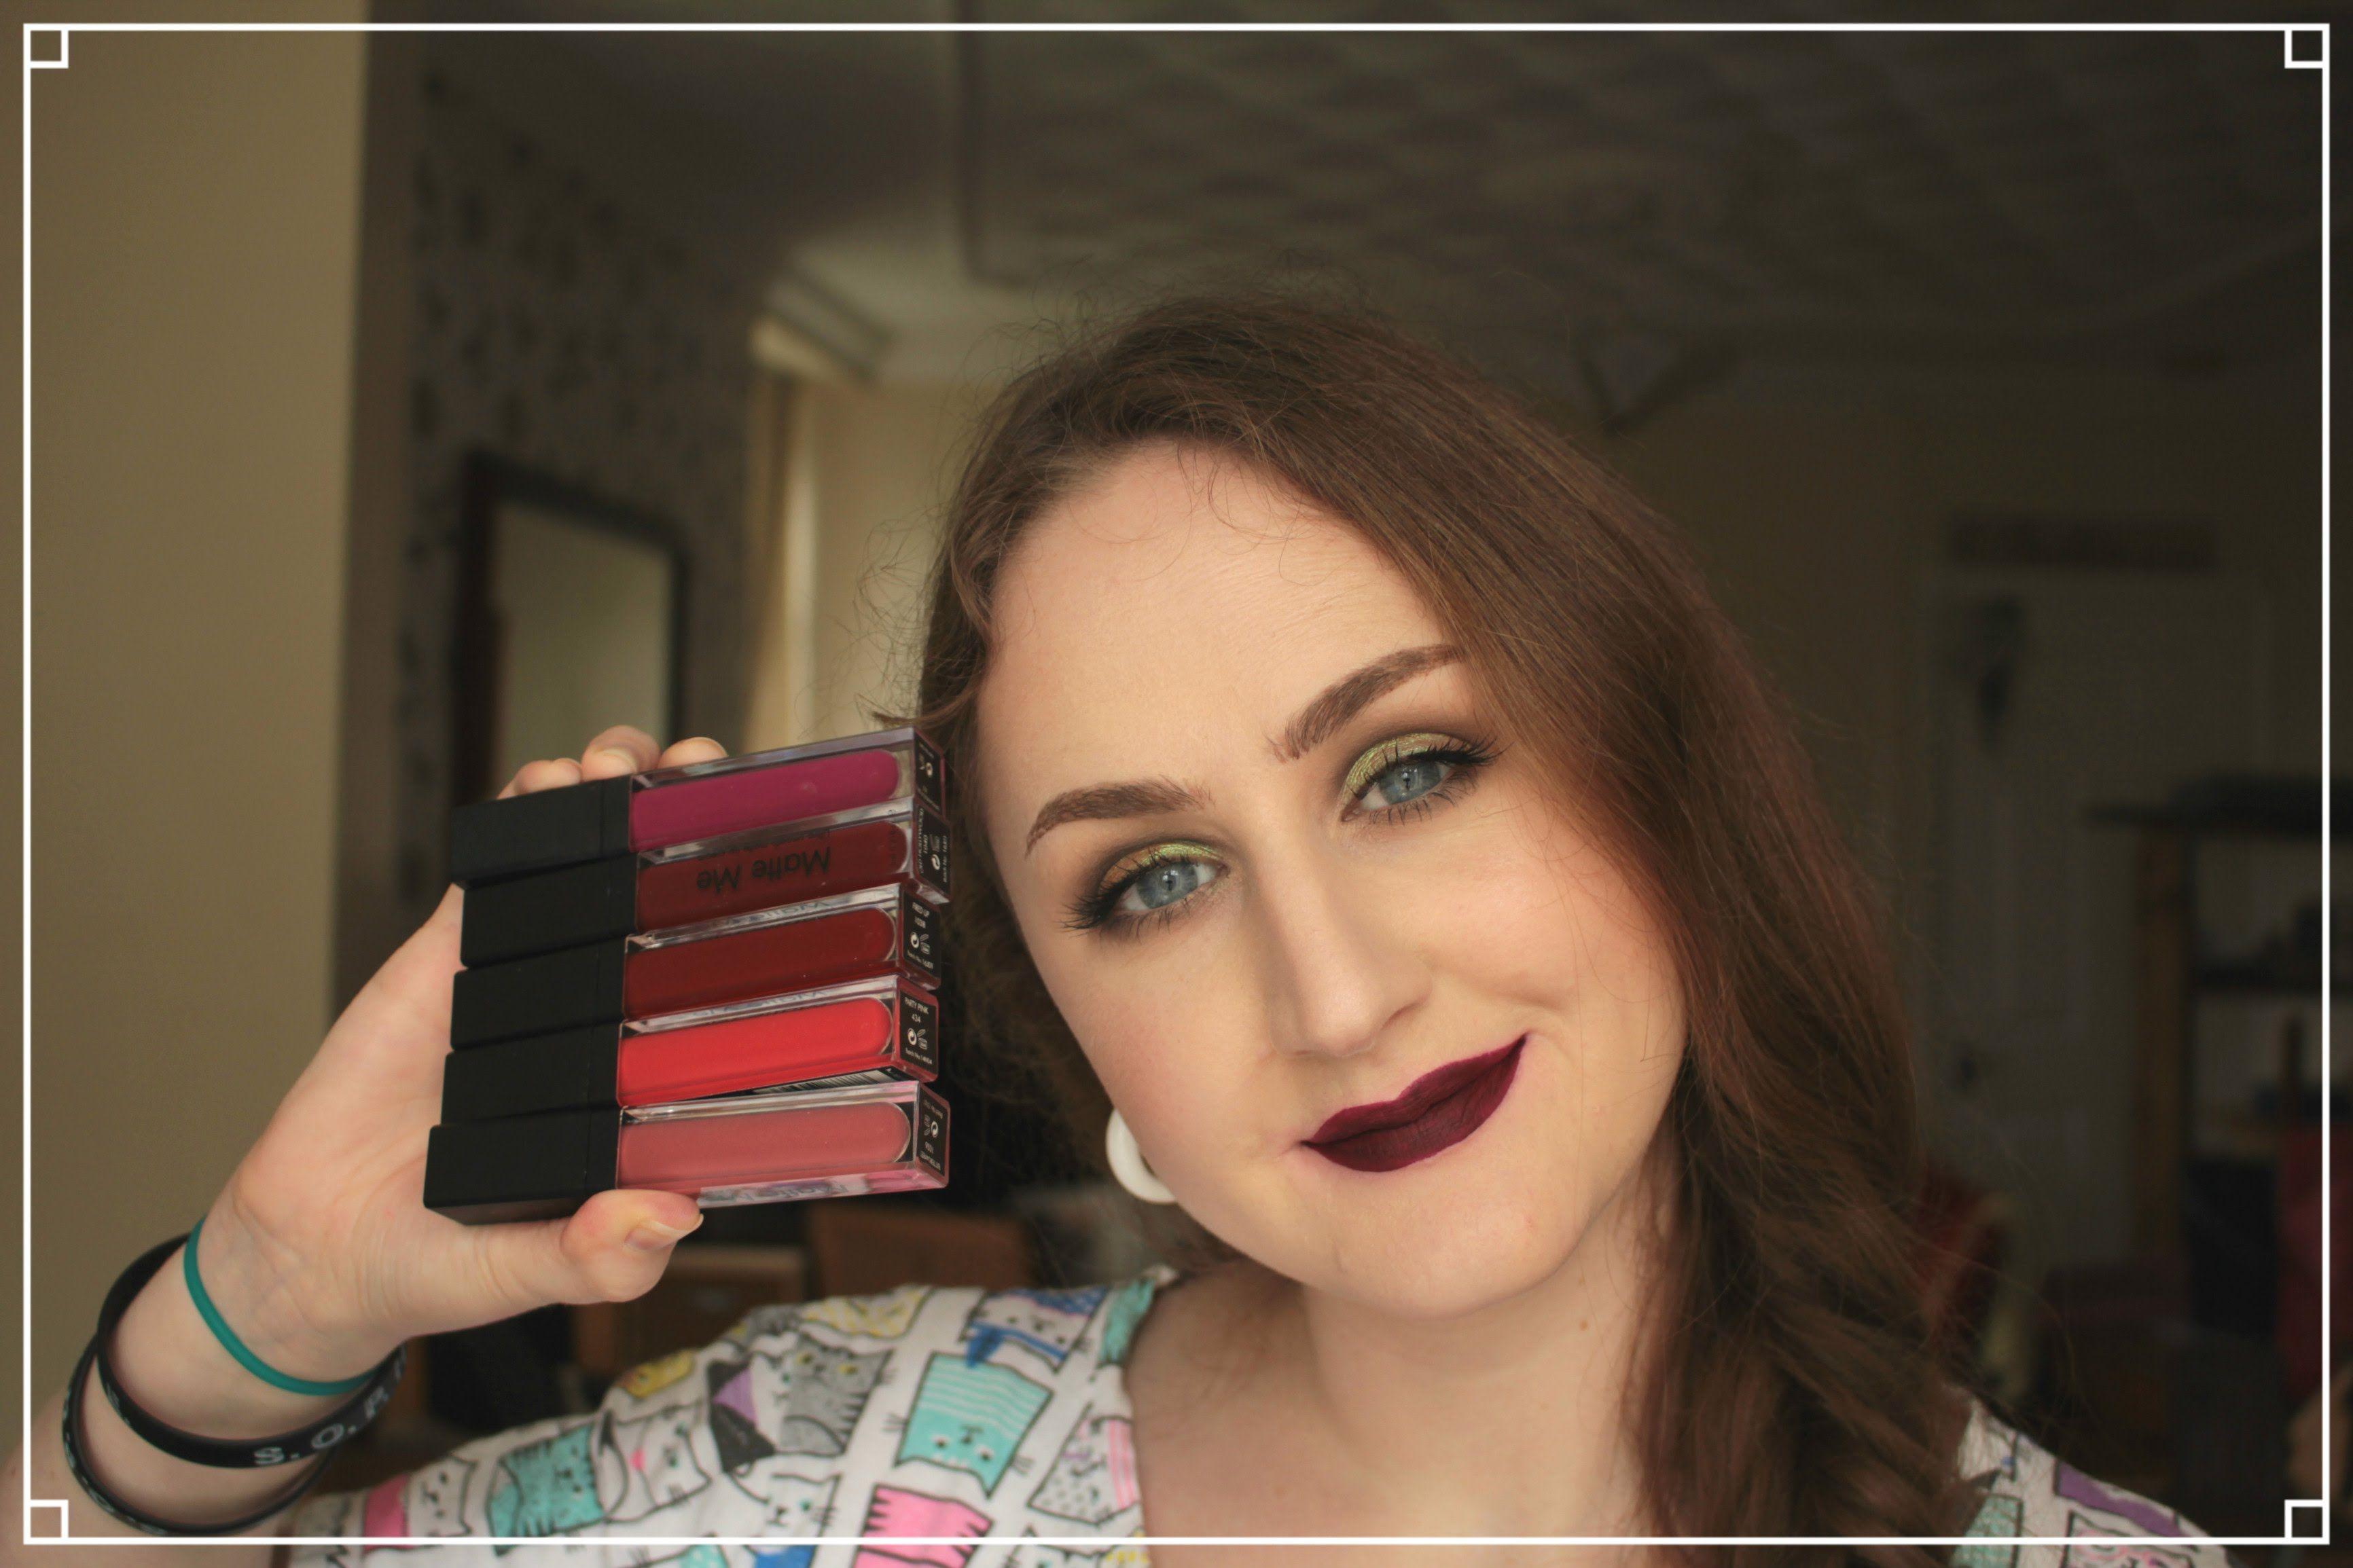 Sleek Matte Me Lip Swatches #sleek #mattelipstick #liquidlipstick #boots #superdrug #affordable #bargain #makeup #lipswatches